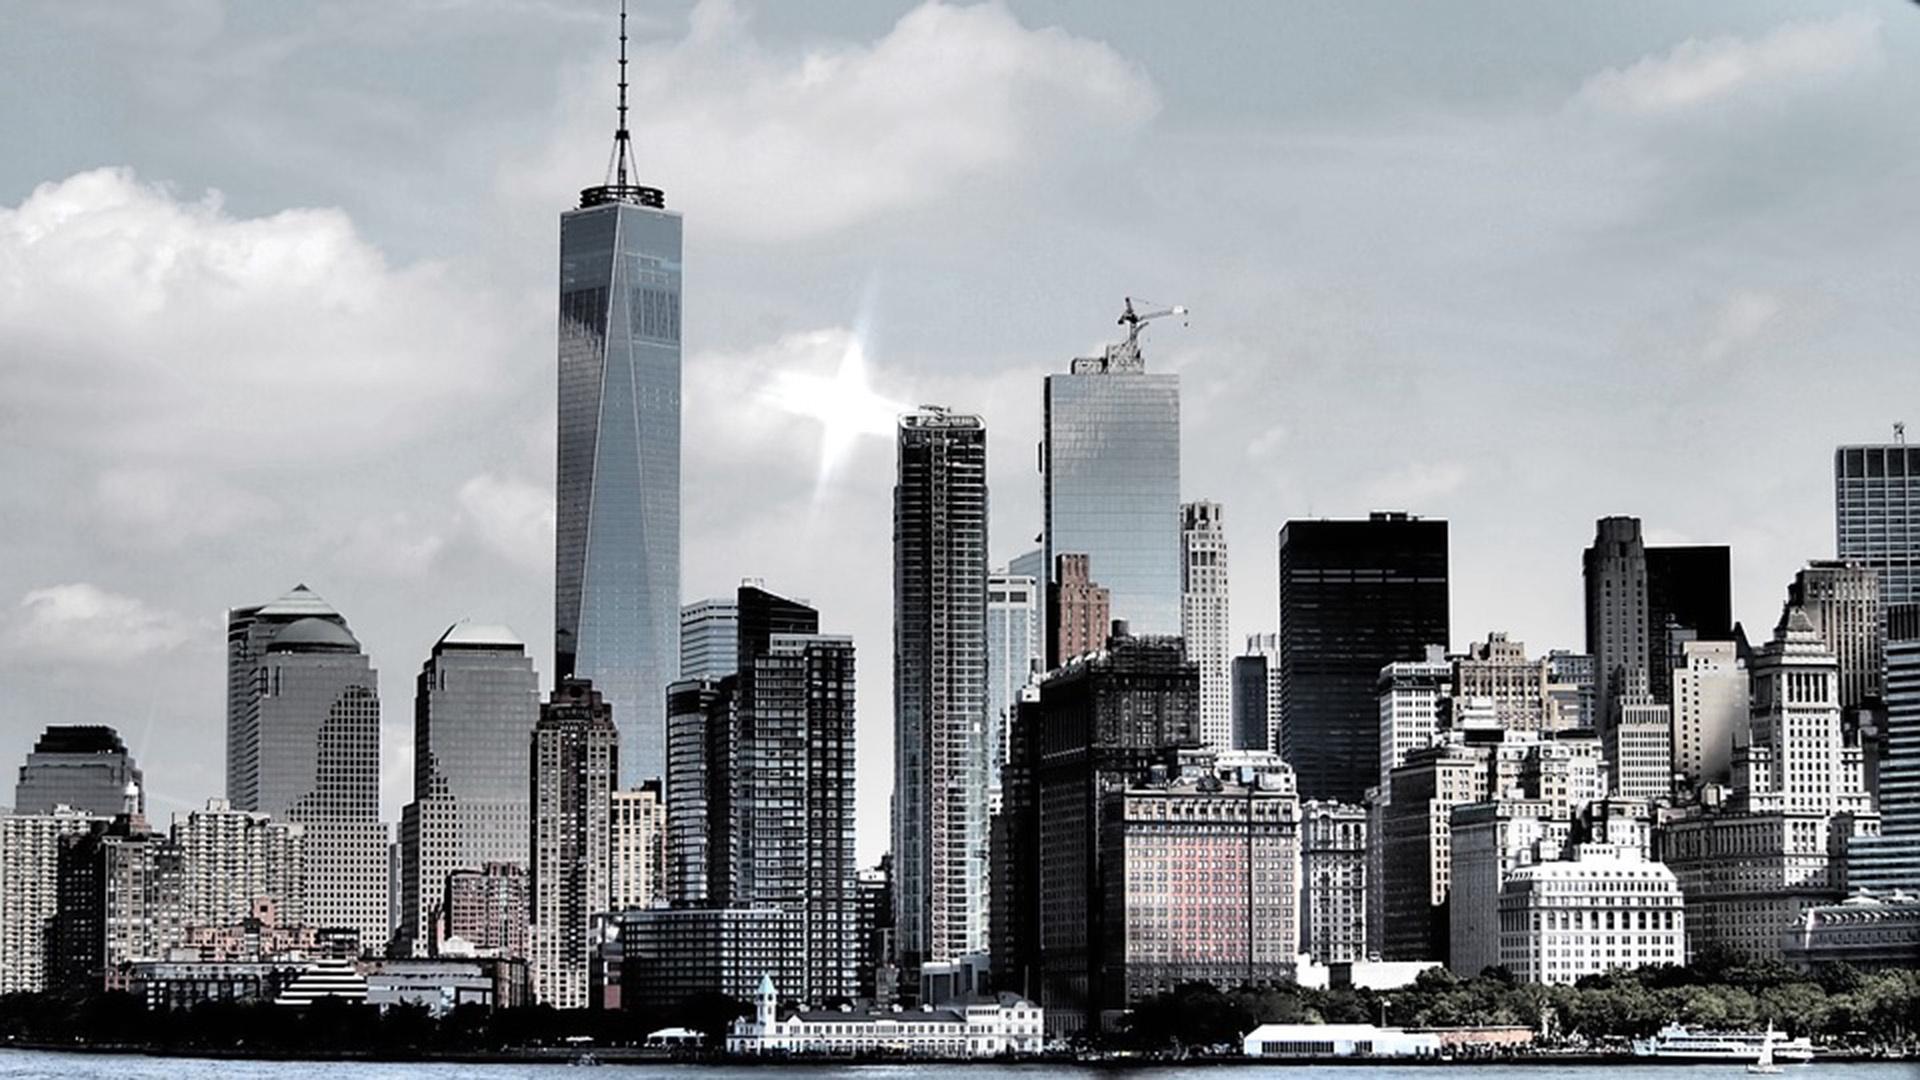 new york city skyscrapers cityscape skyline